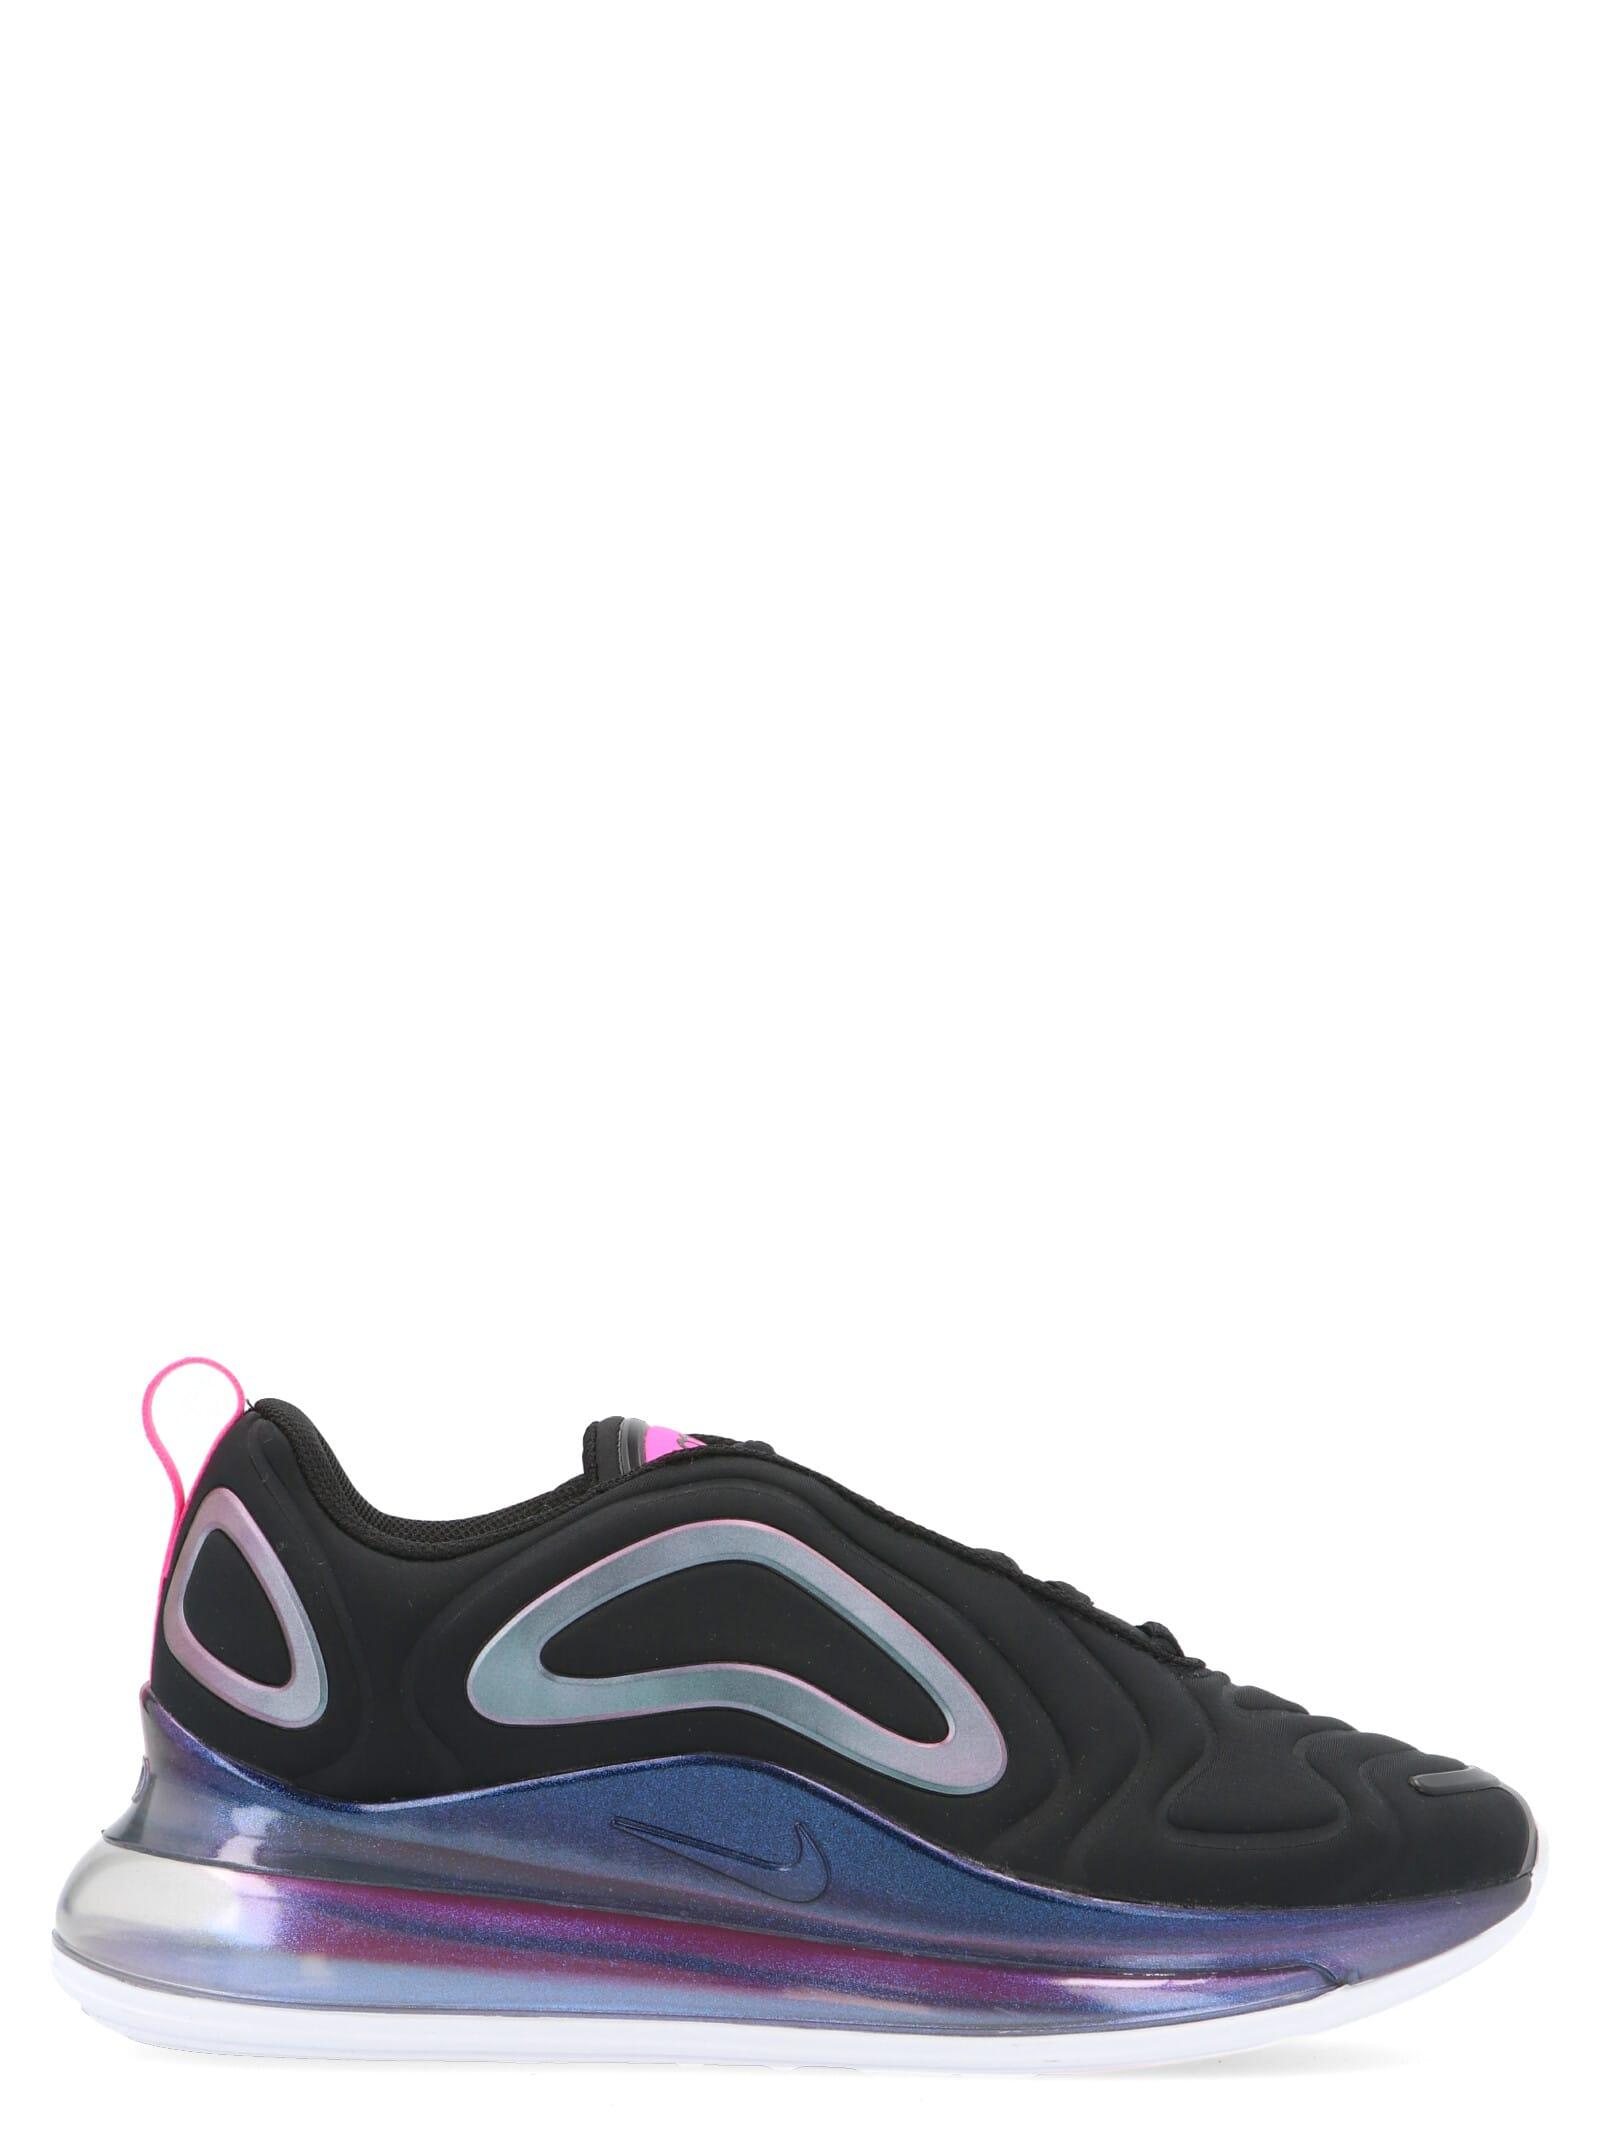 'air Max Nike 720 Se' Shoes j4ARL5